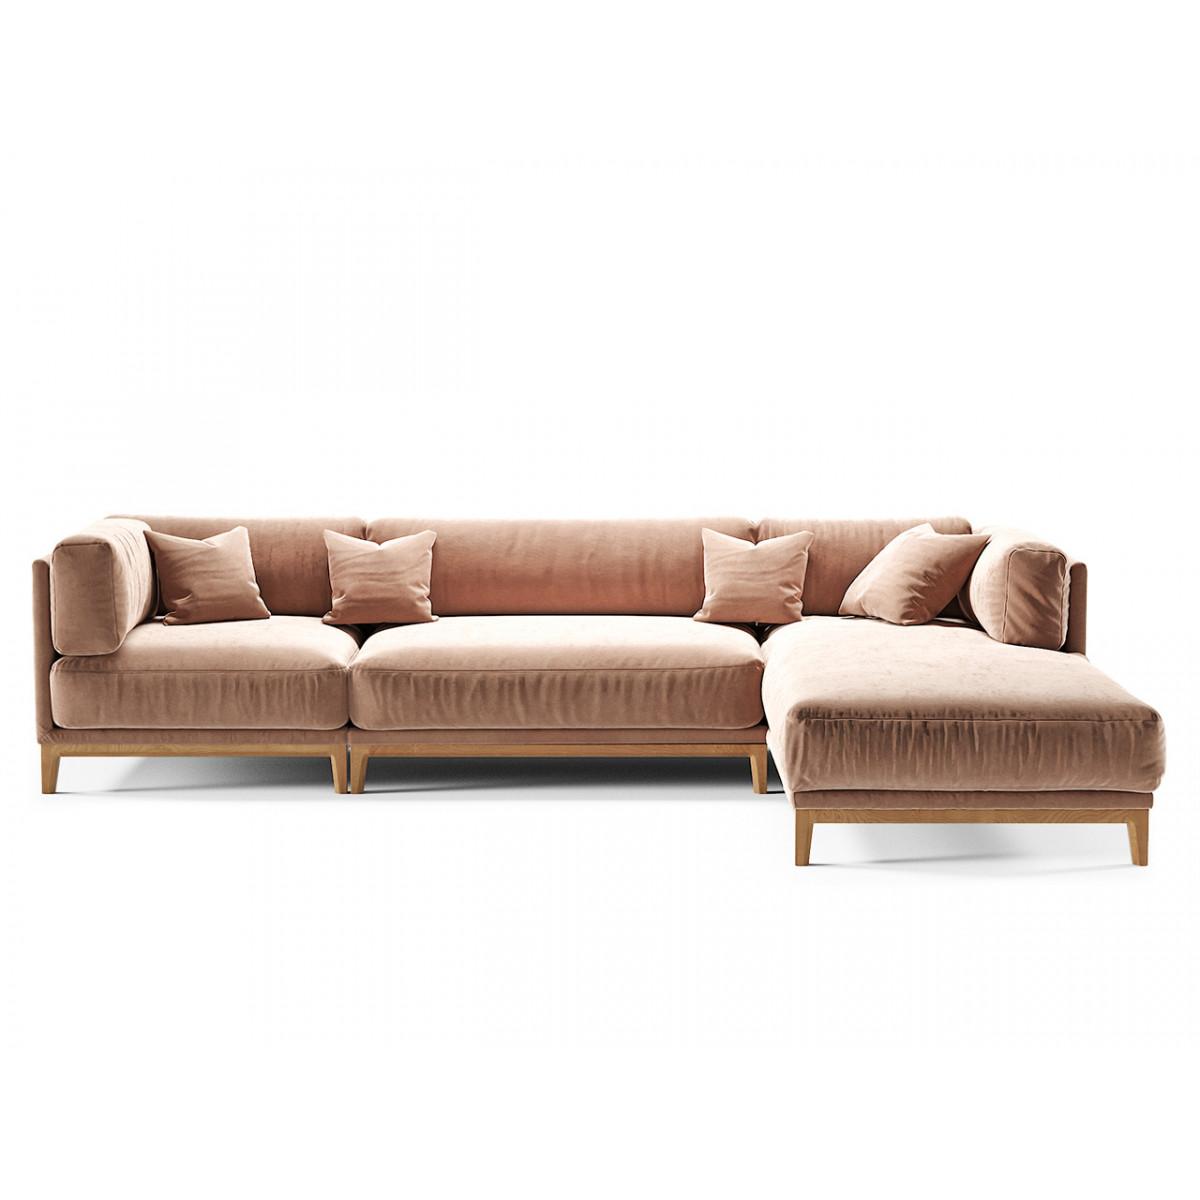 The idea диван case бежевый 122299/6